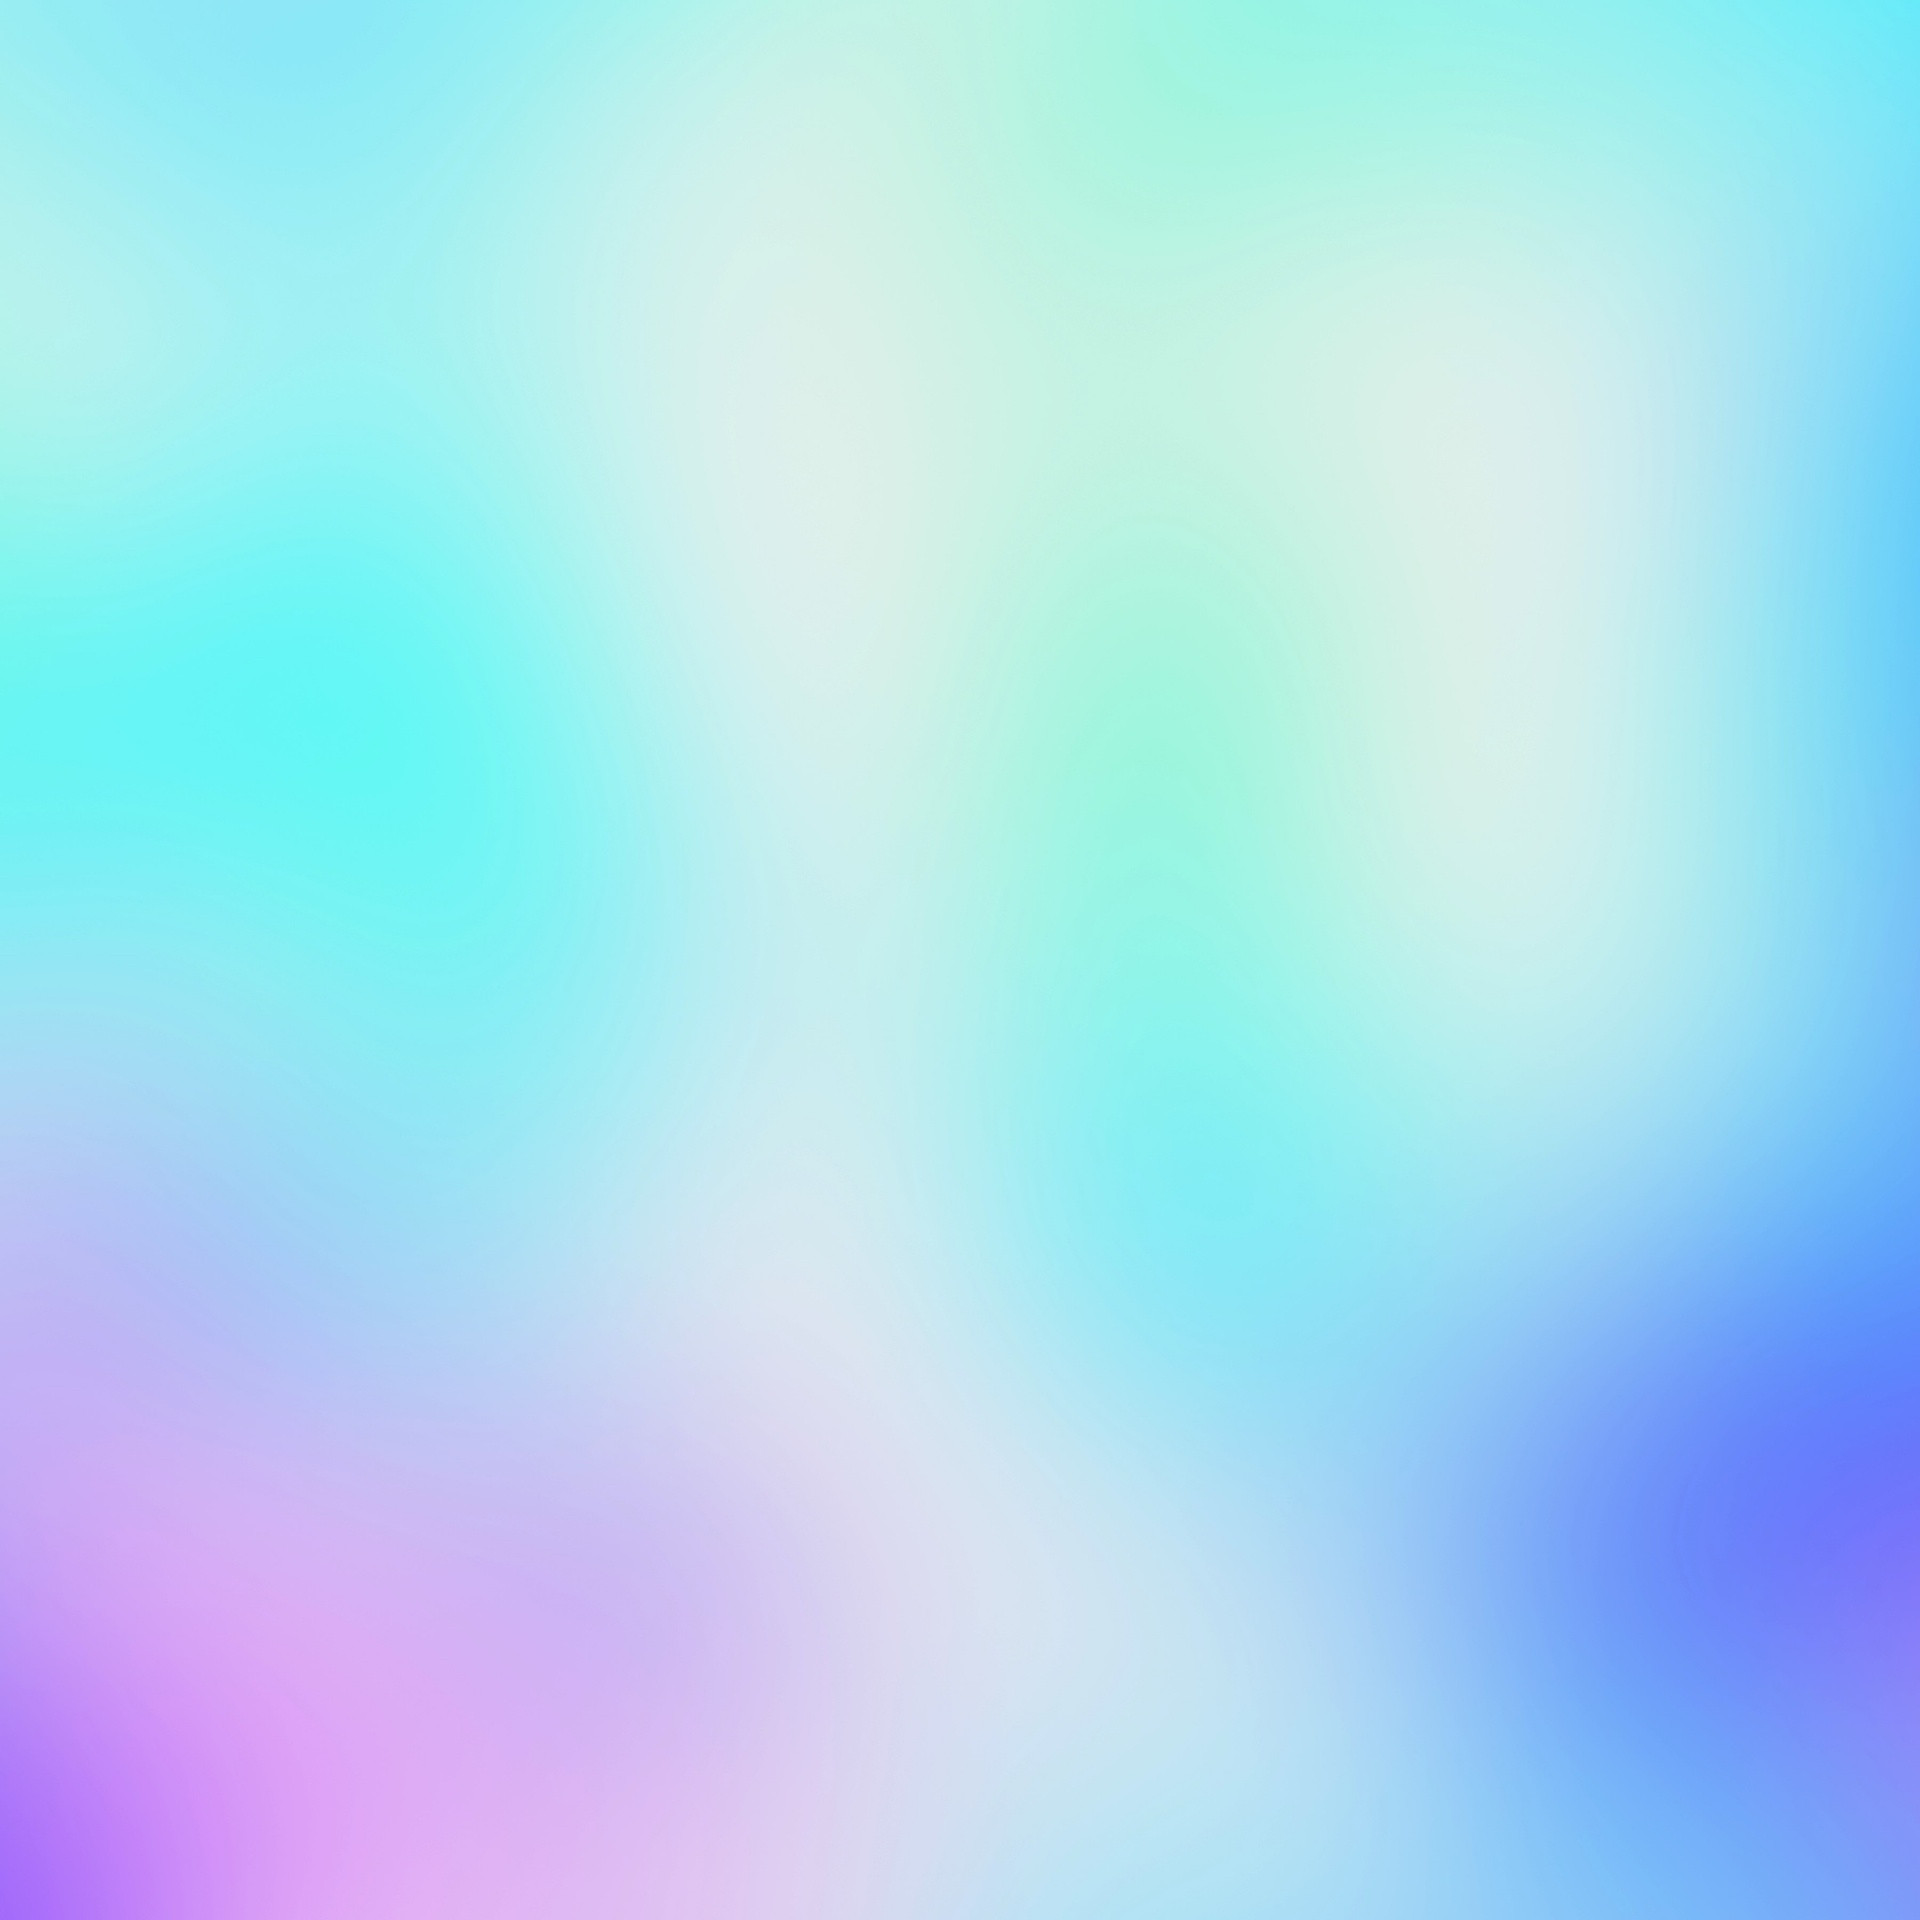 degrade-de-couleur-14.jpg